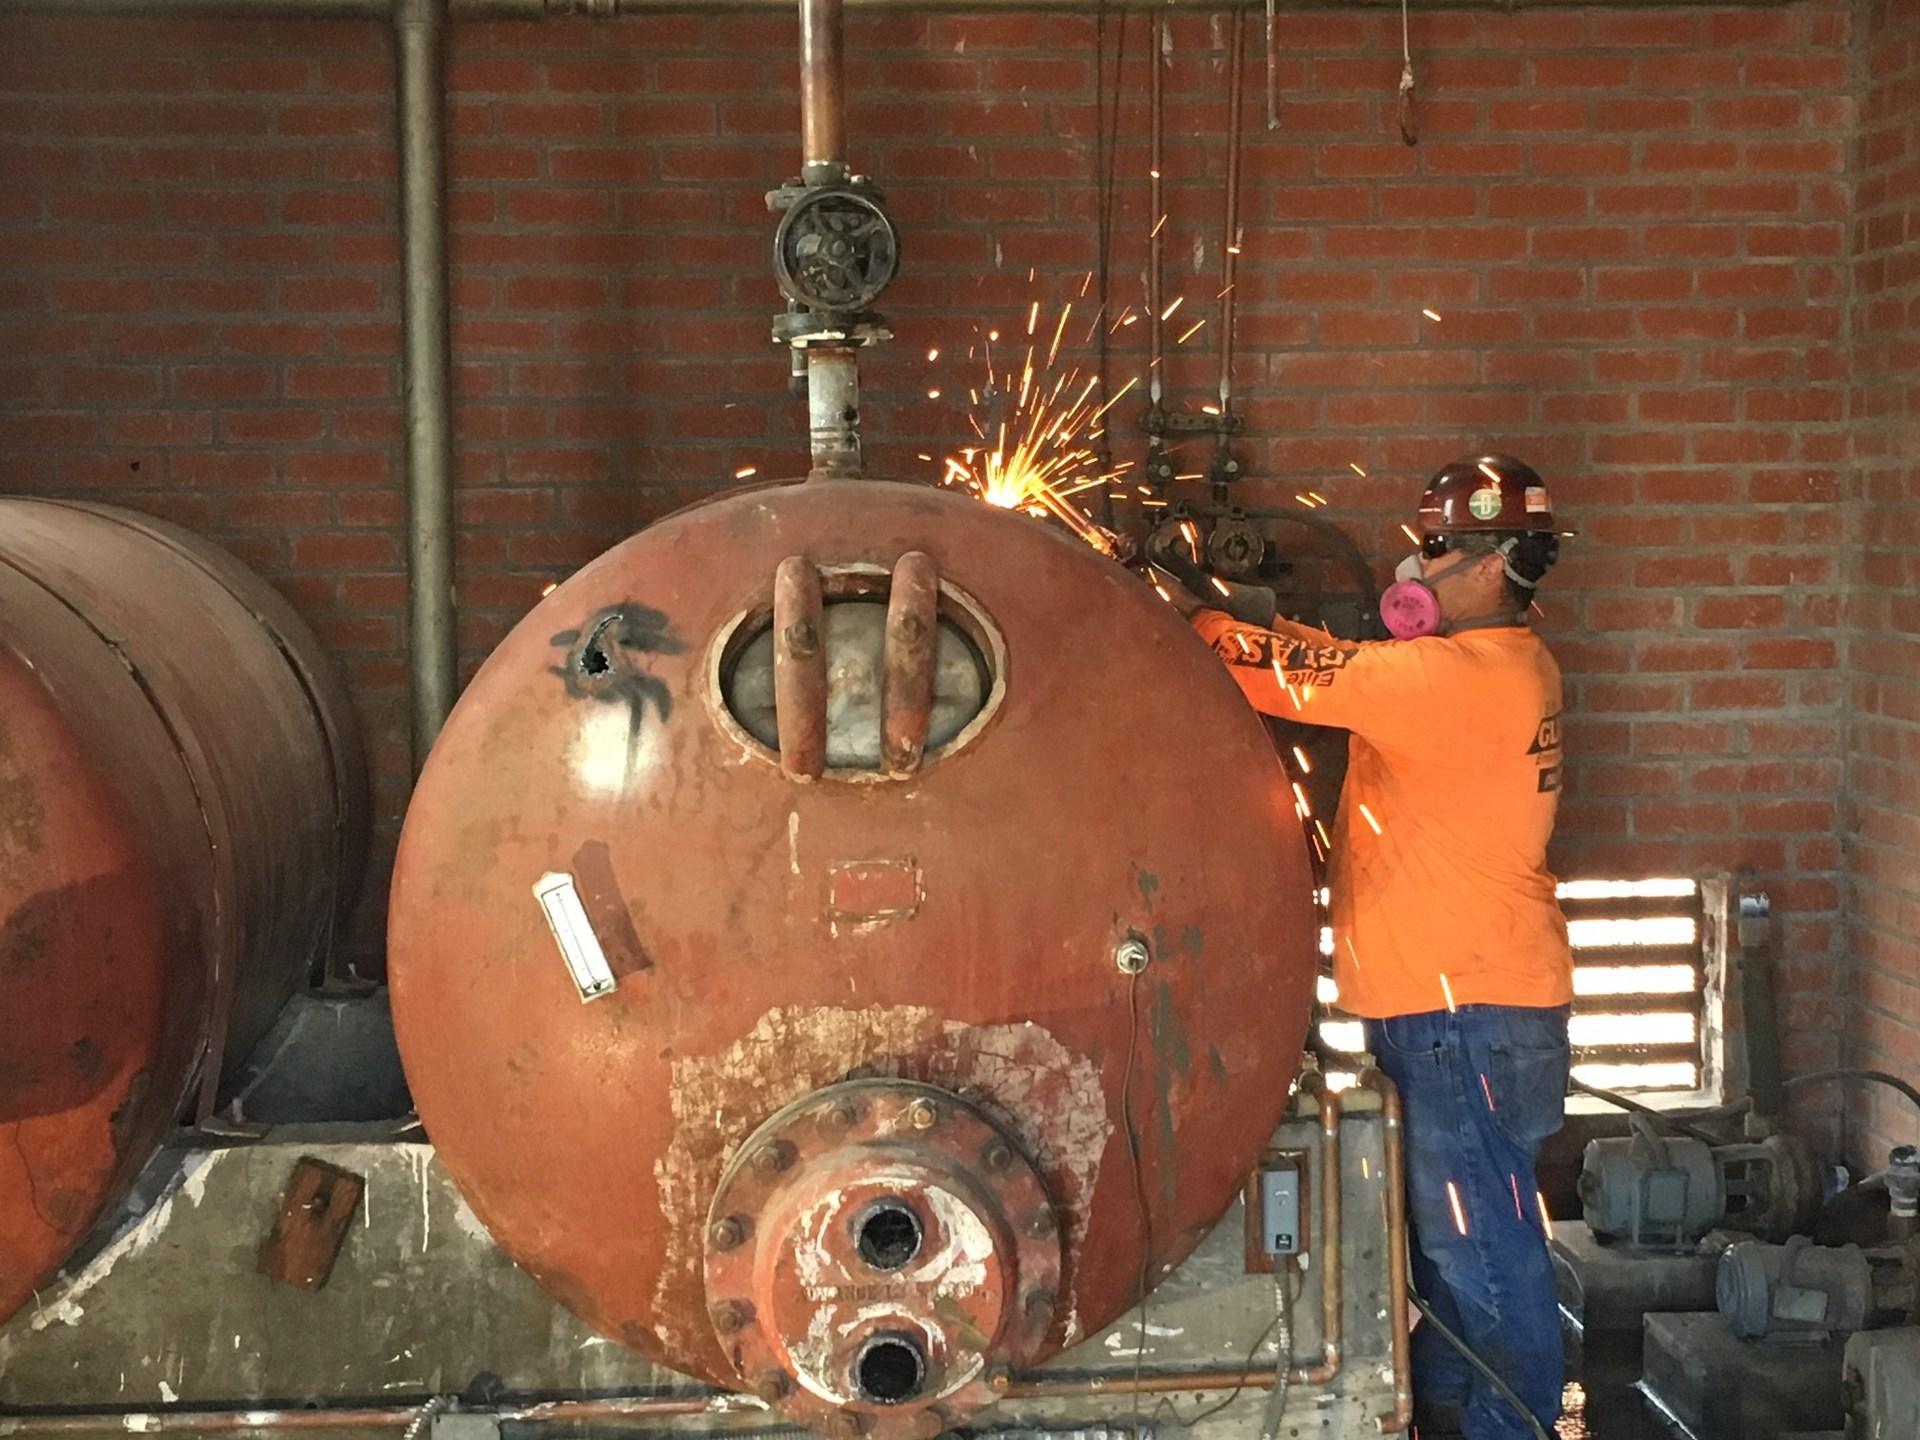 granada boiler room